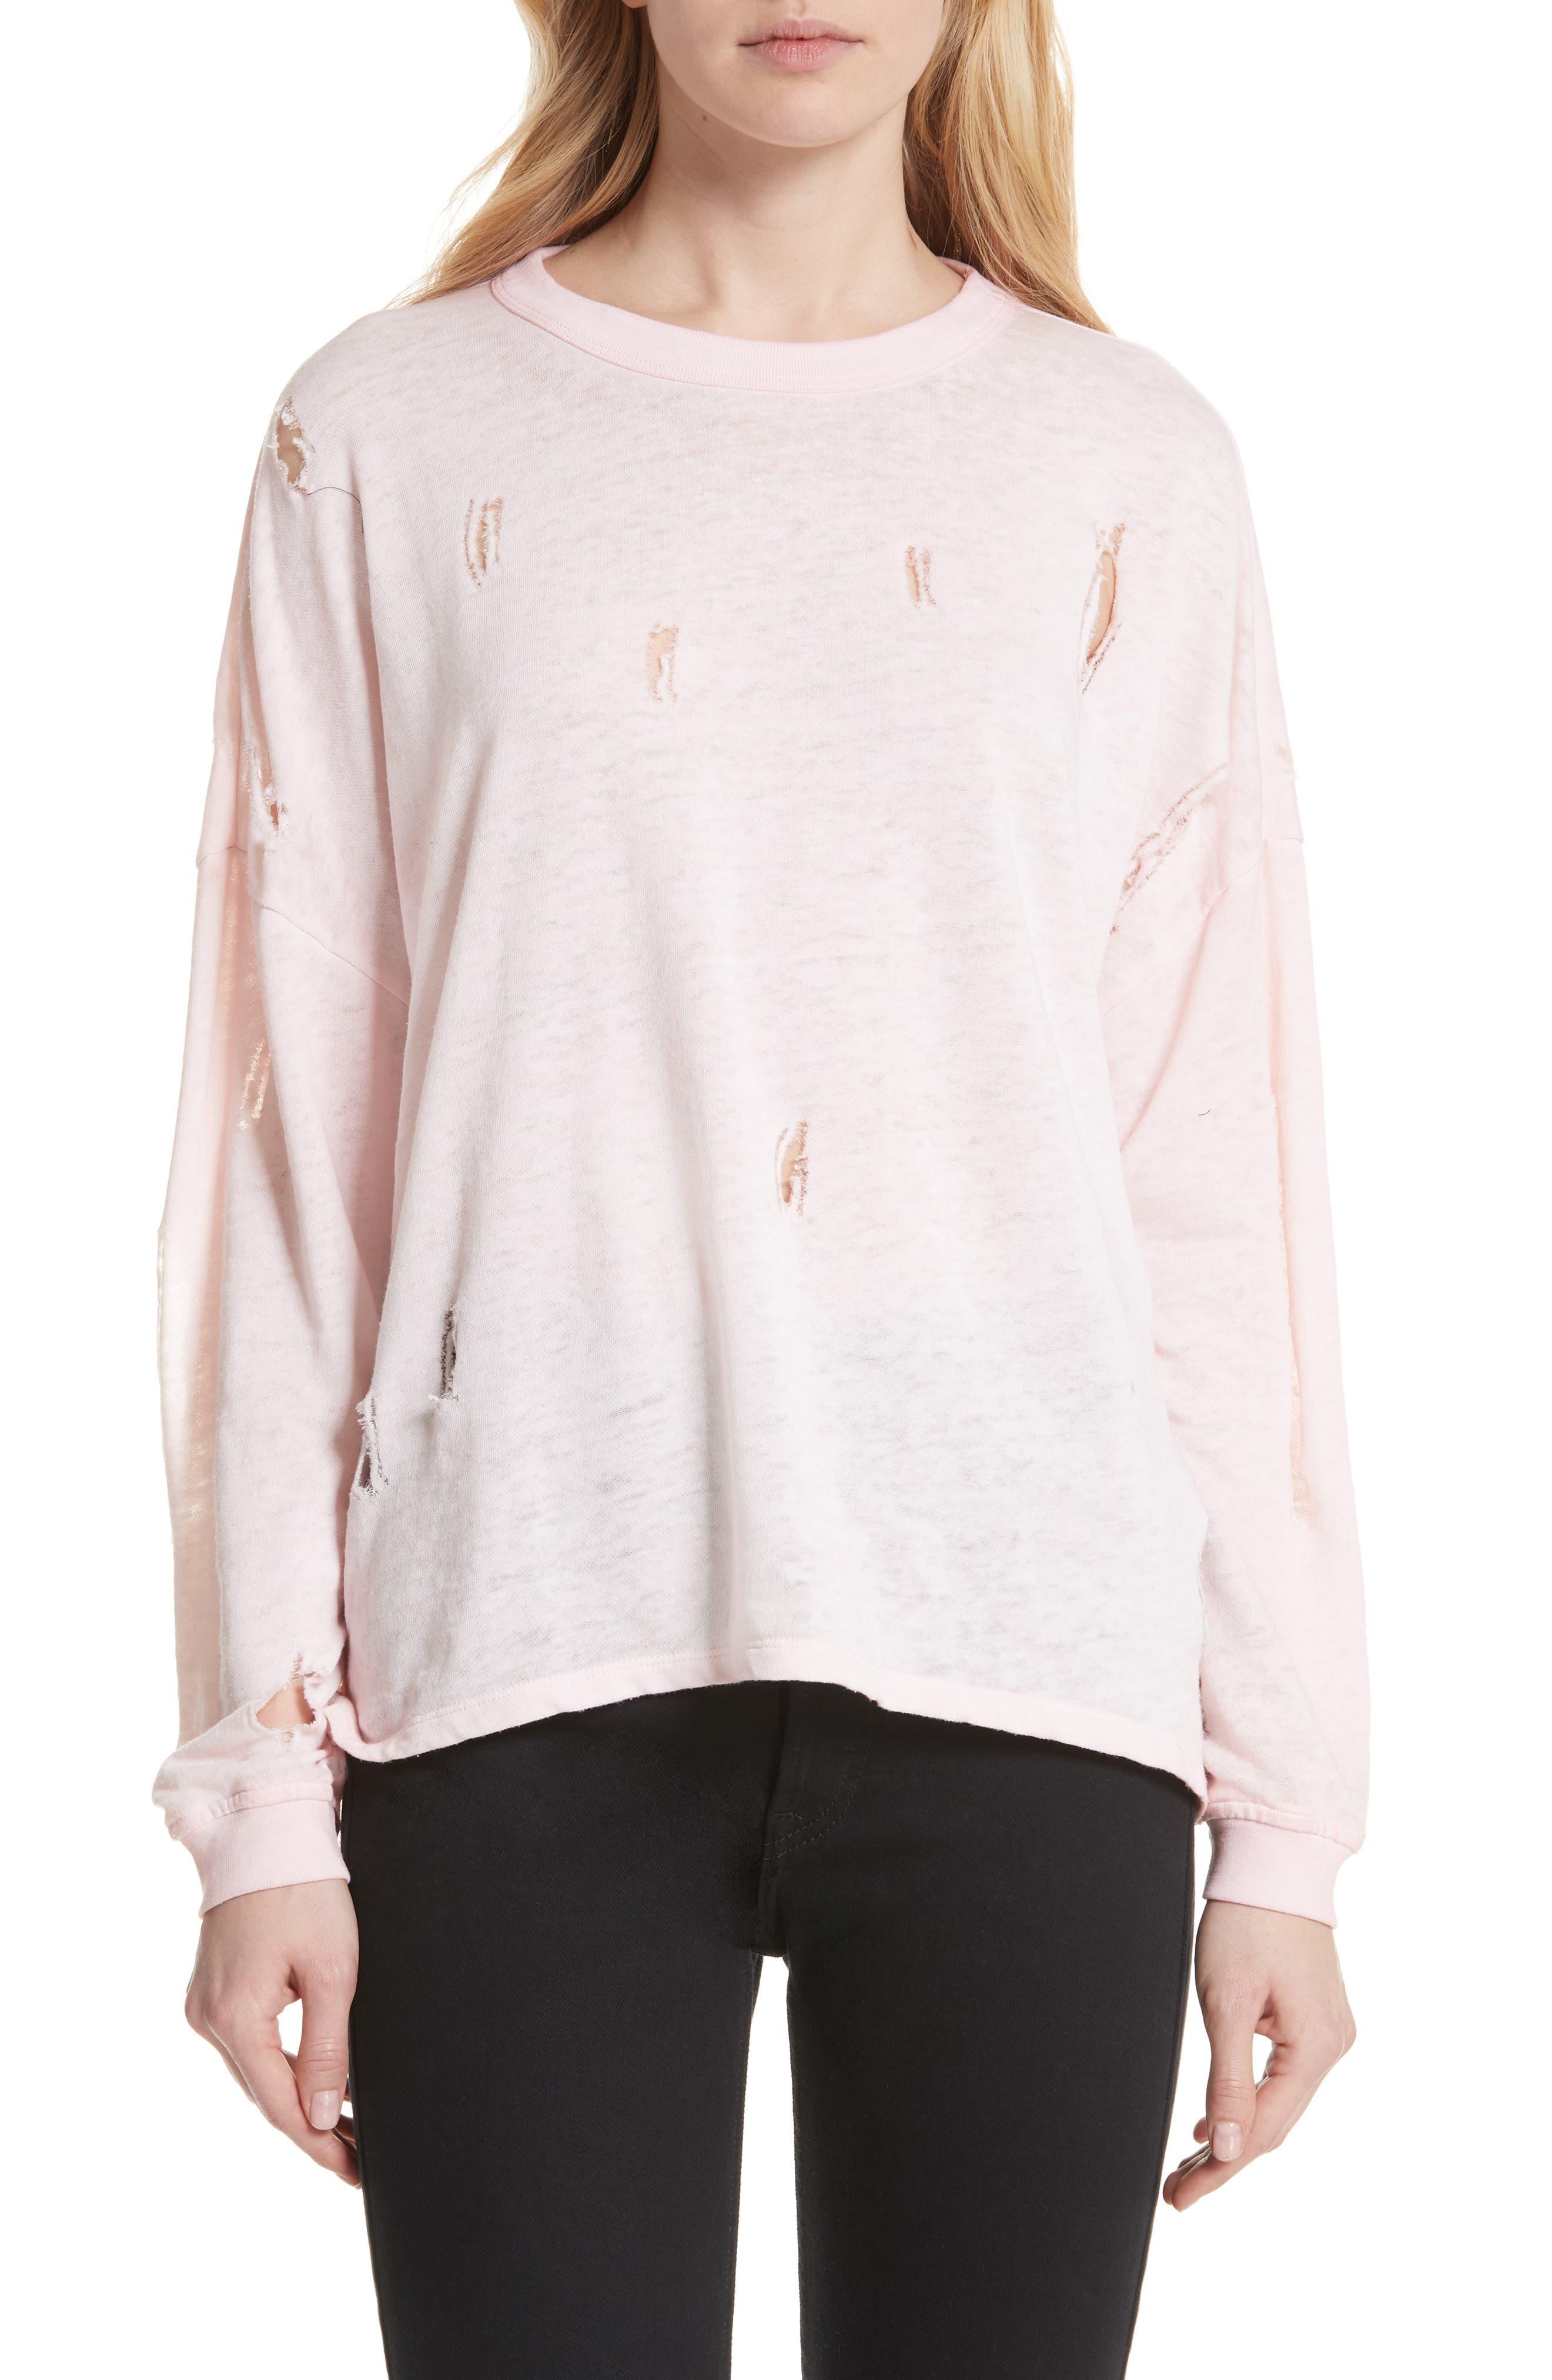 Lyzza Distressed Sweatshirt,                             Main thumbnail 1, color,                             Pink Sand